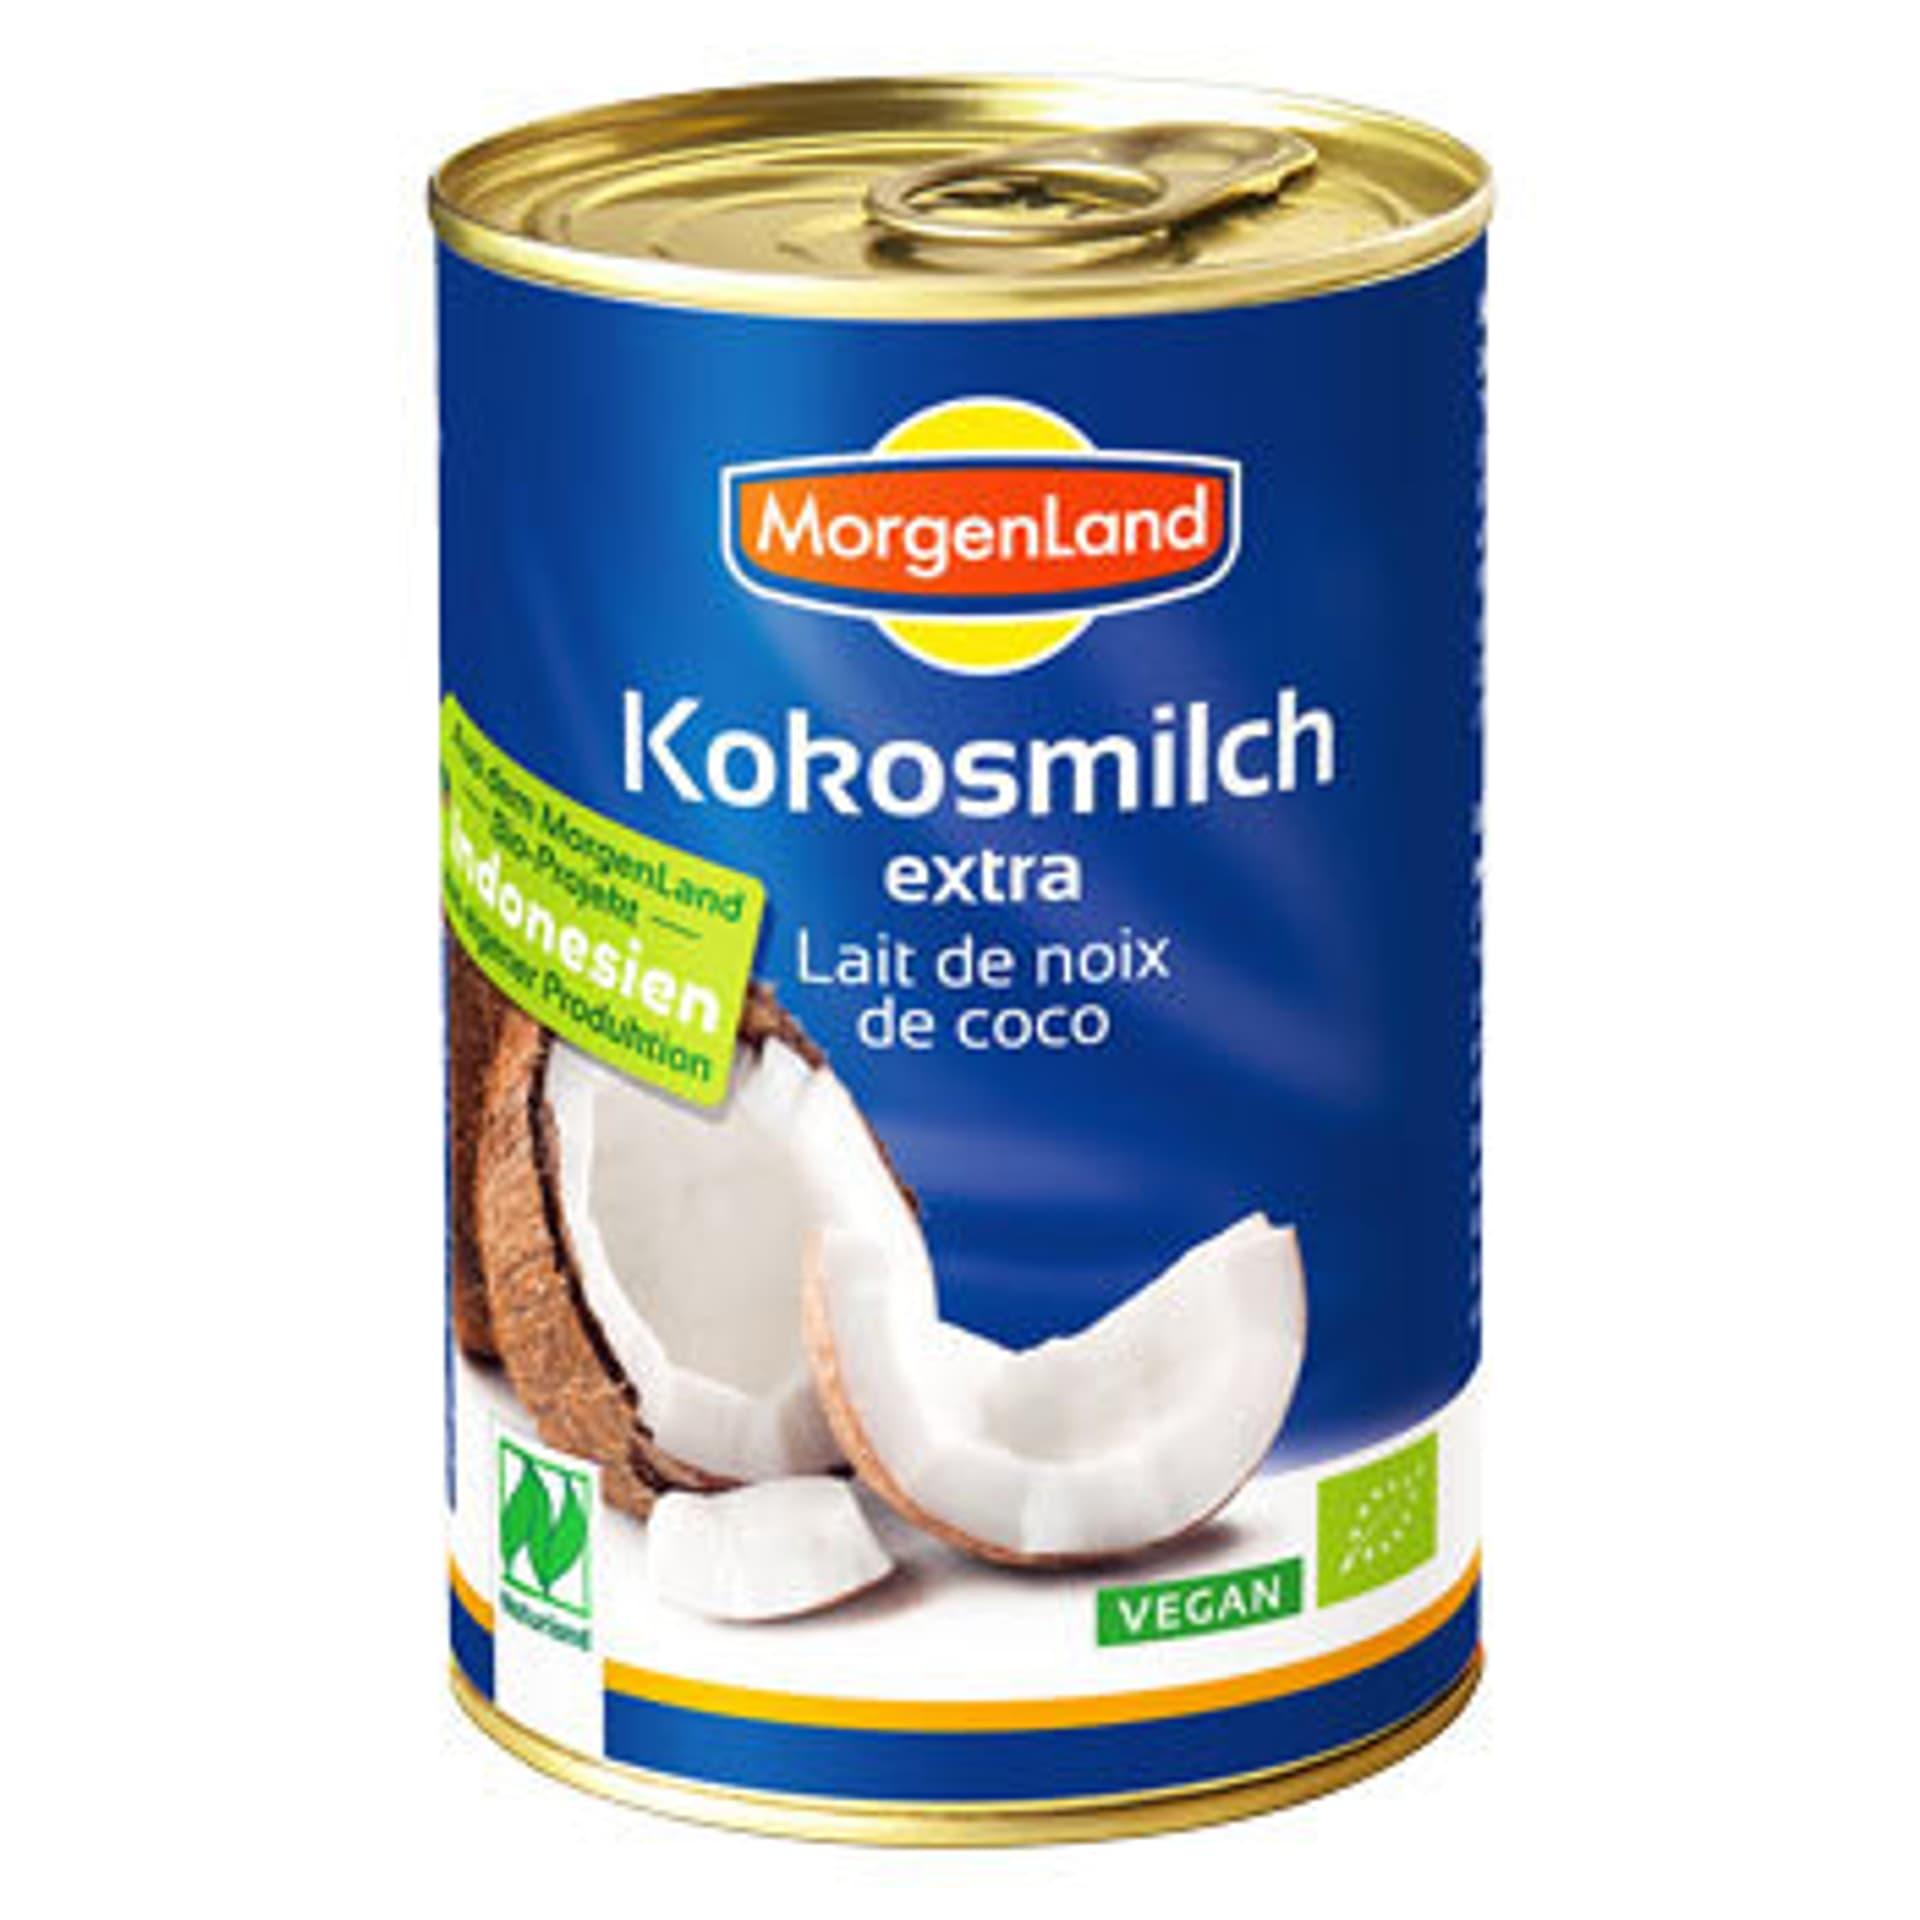 Morgenland kokosmilch extra